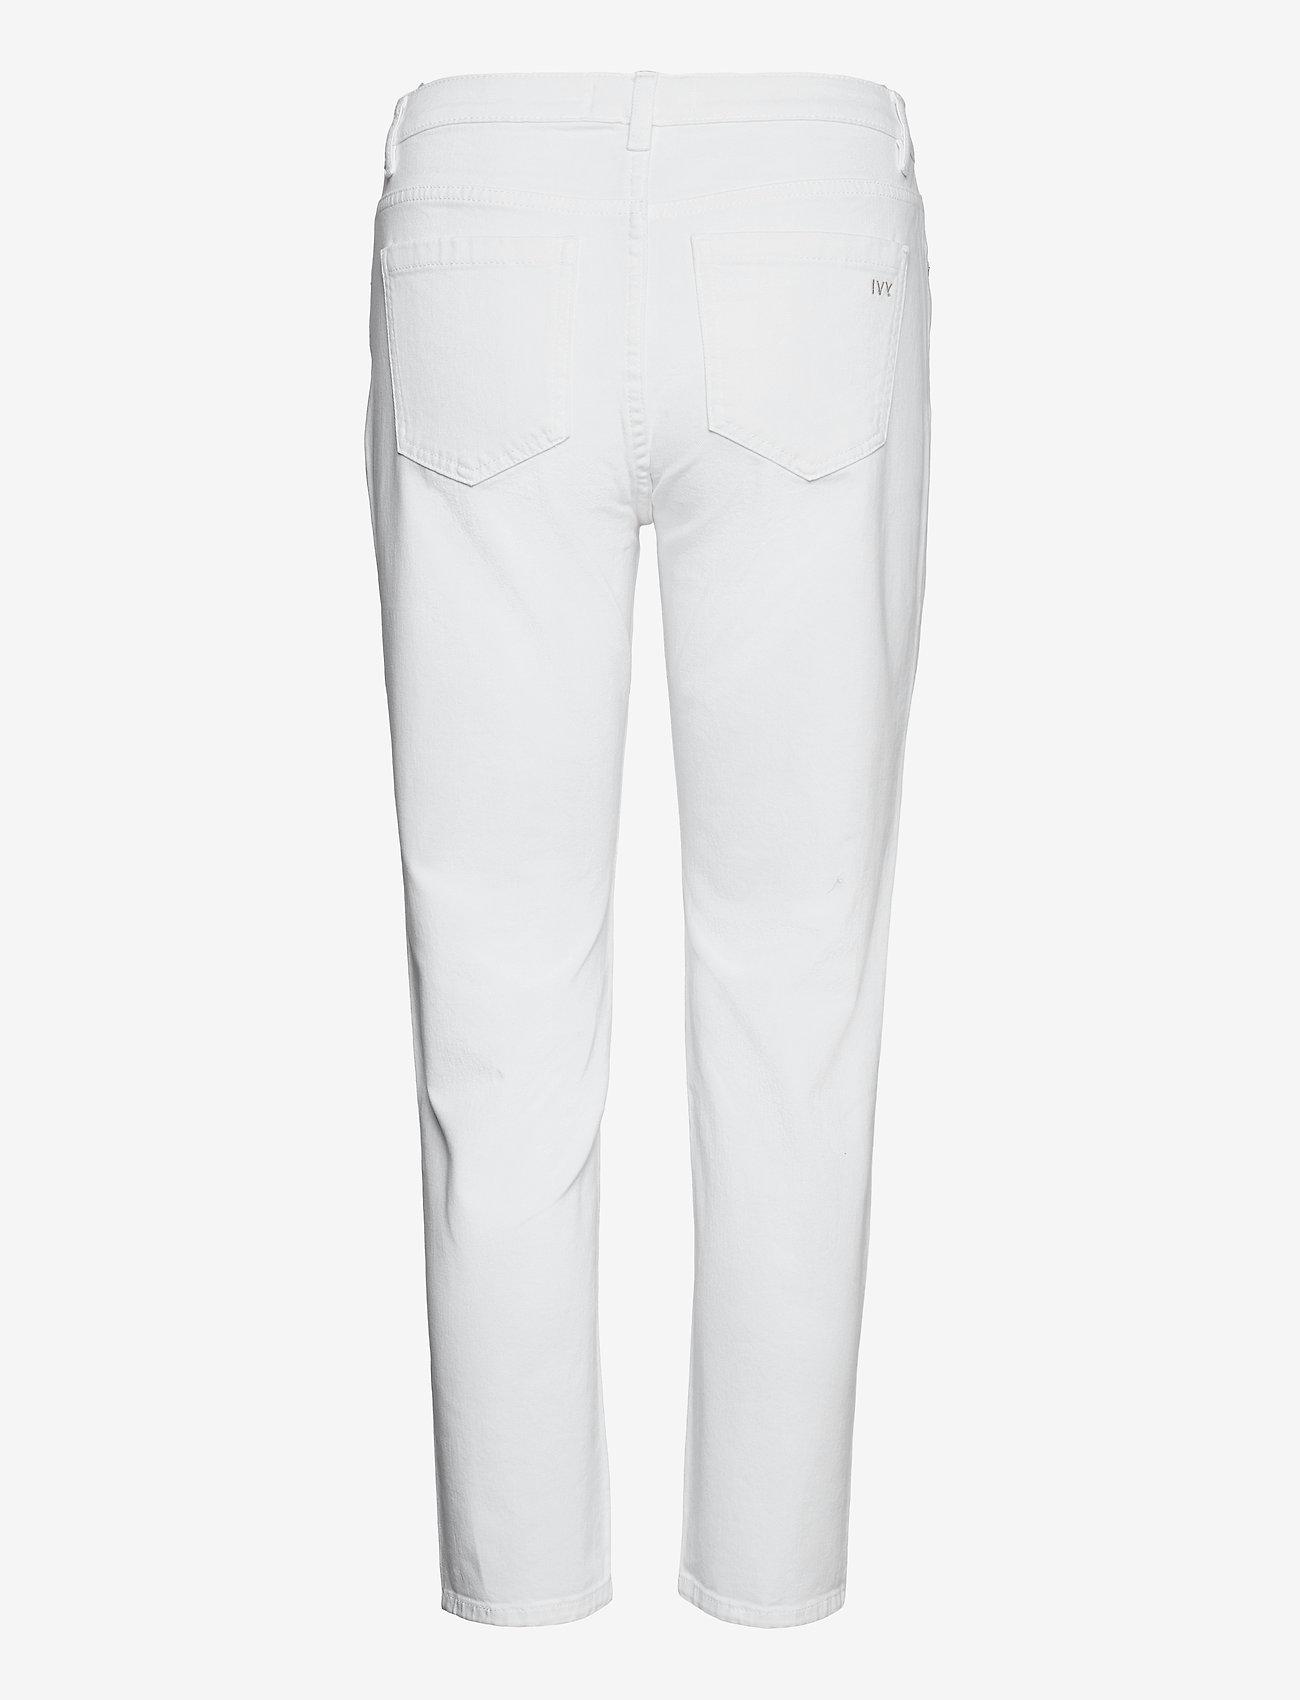 IVY Copenhagen - Lavina MOM white - chinos - white - 1